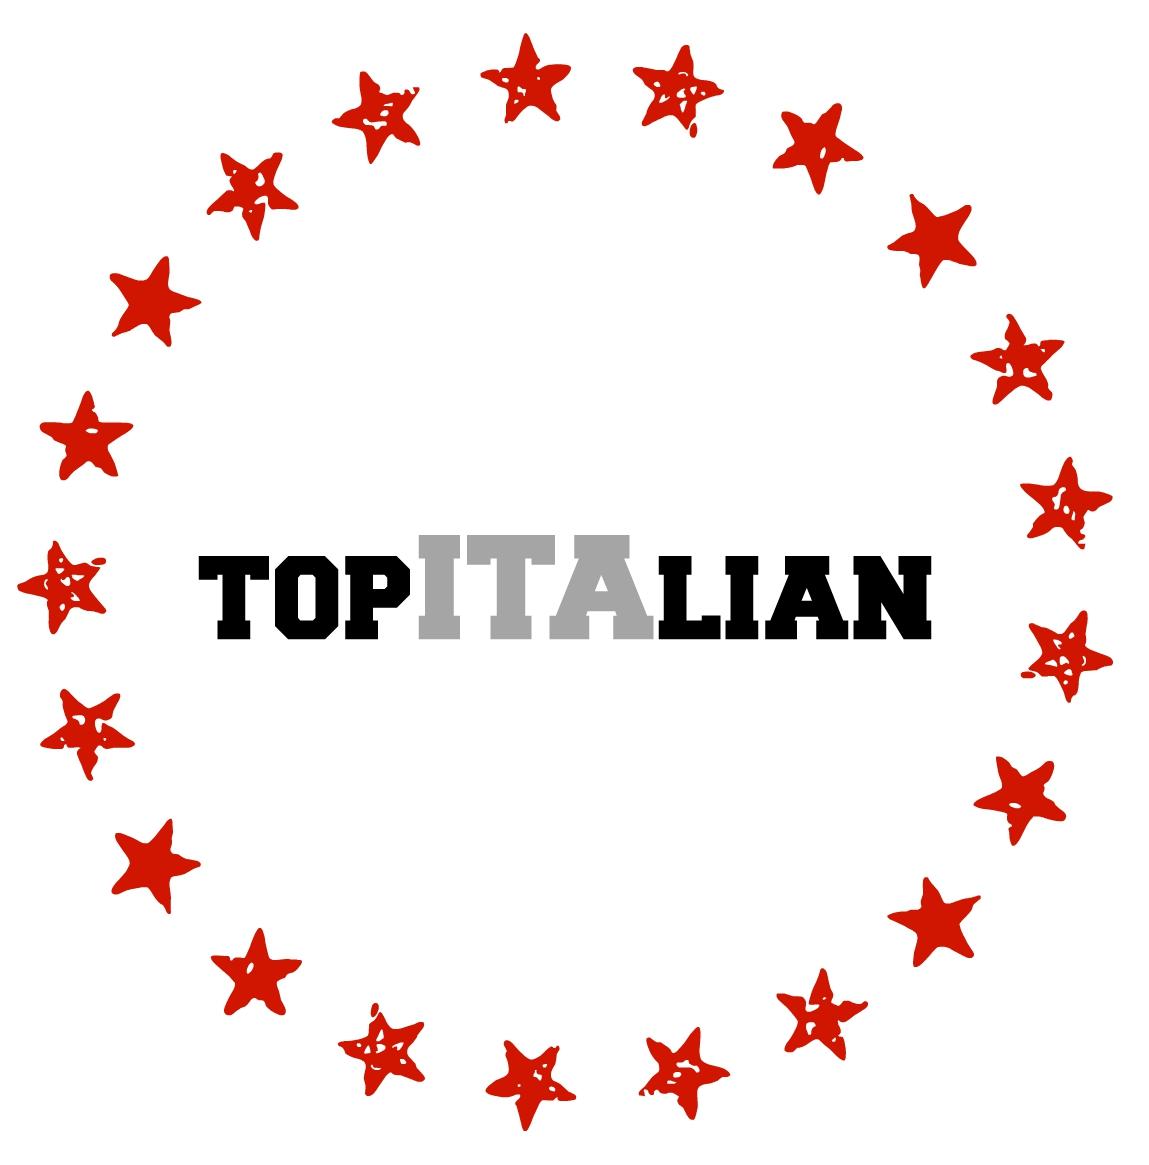 Italian press release